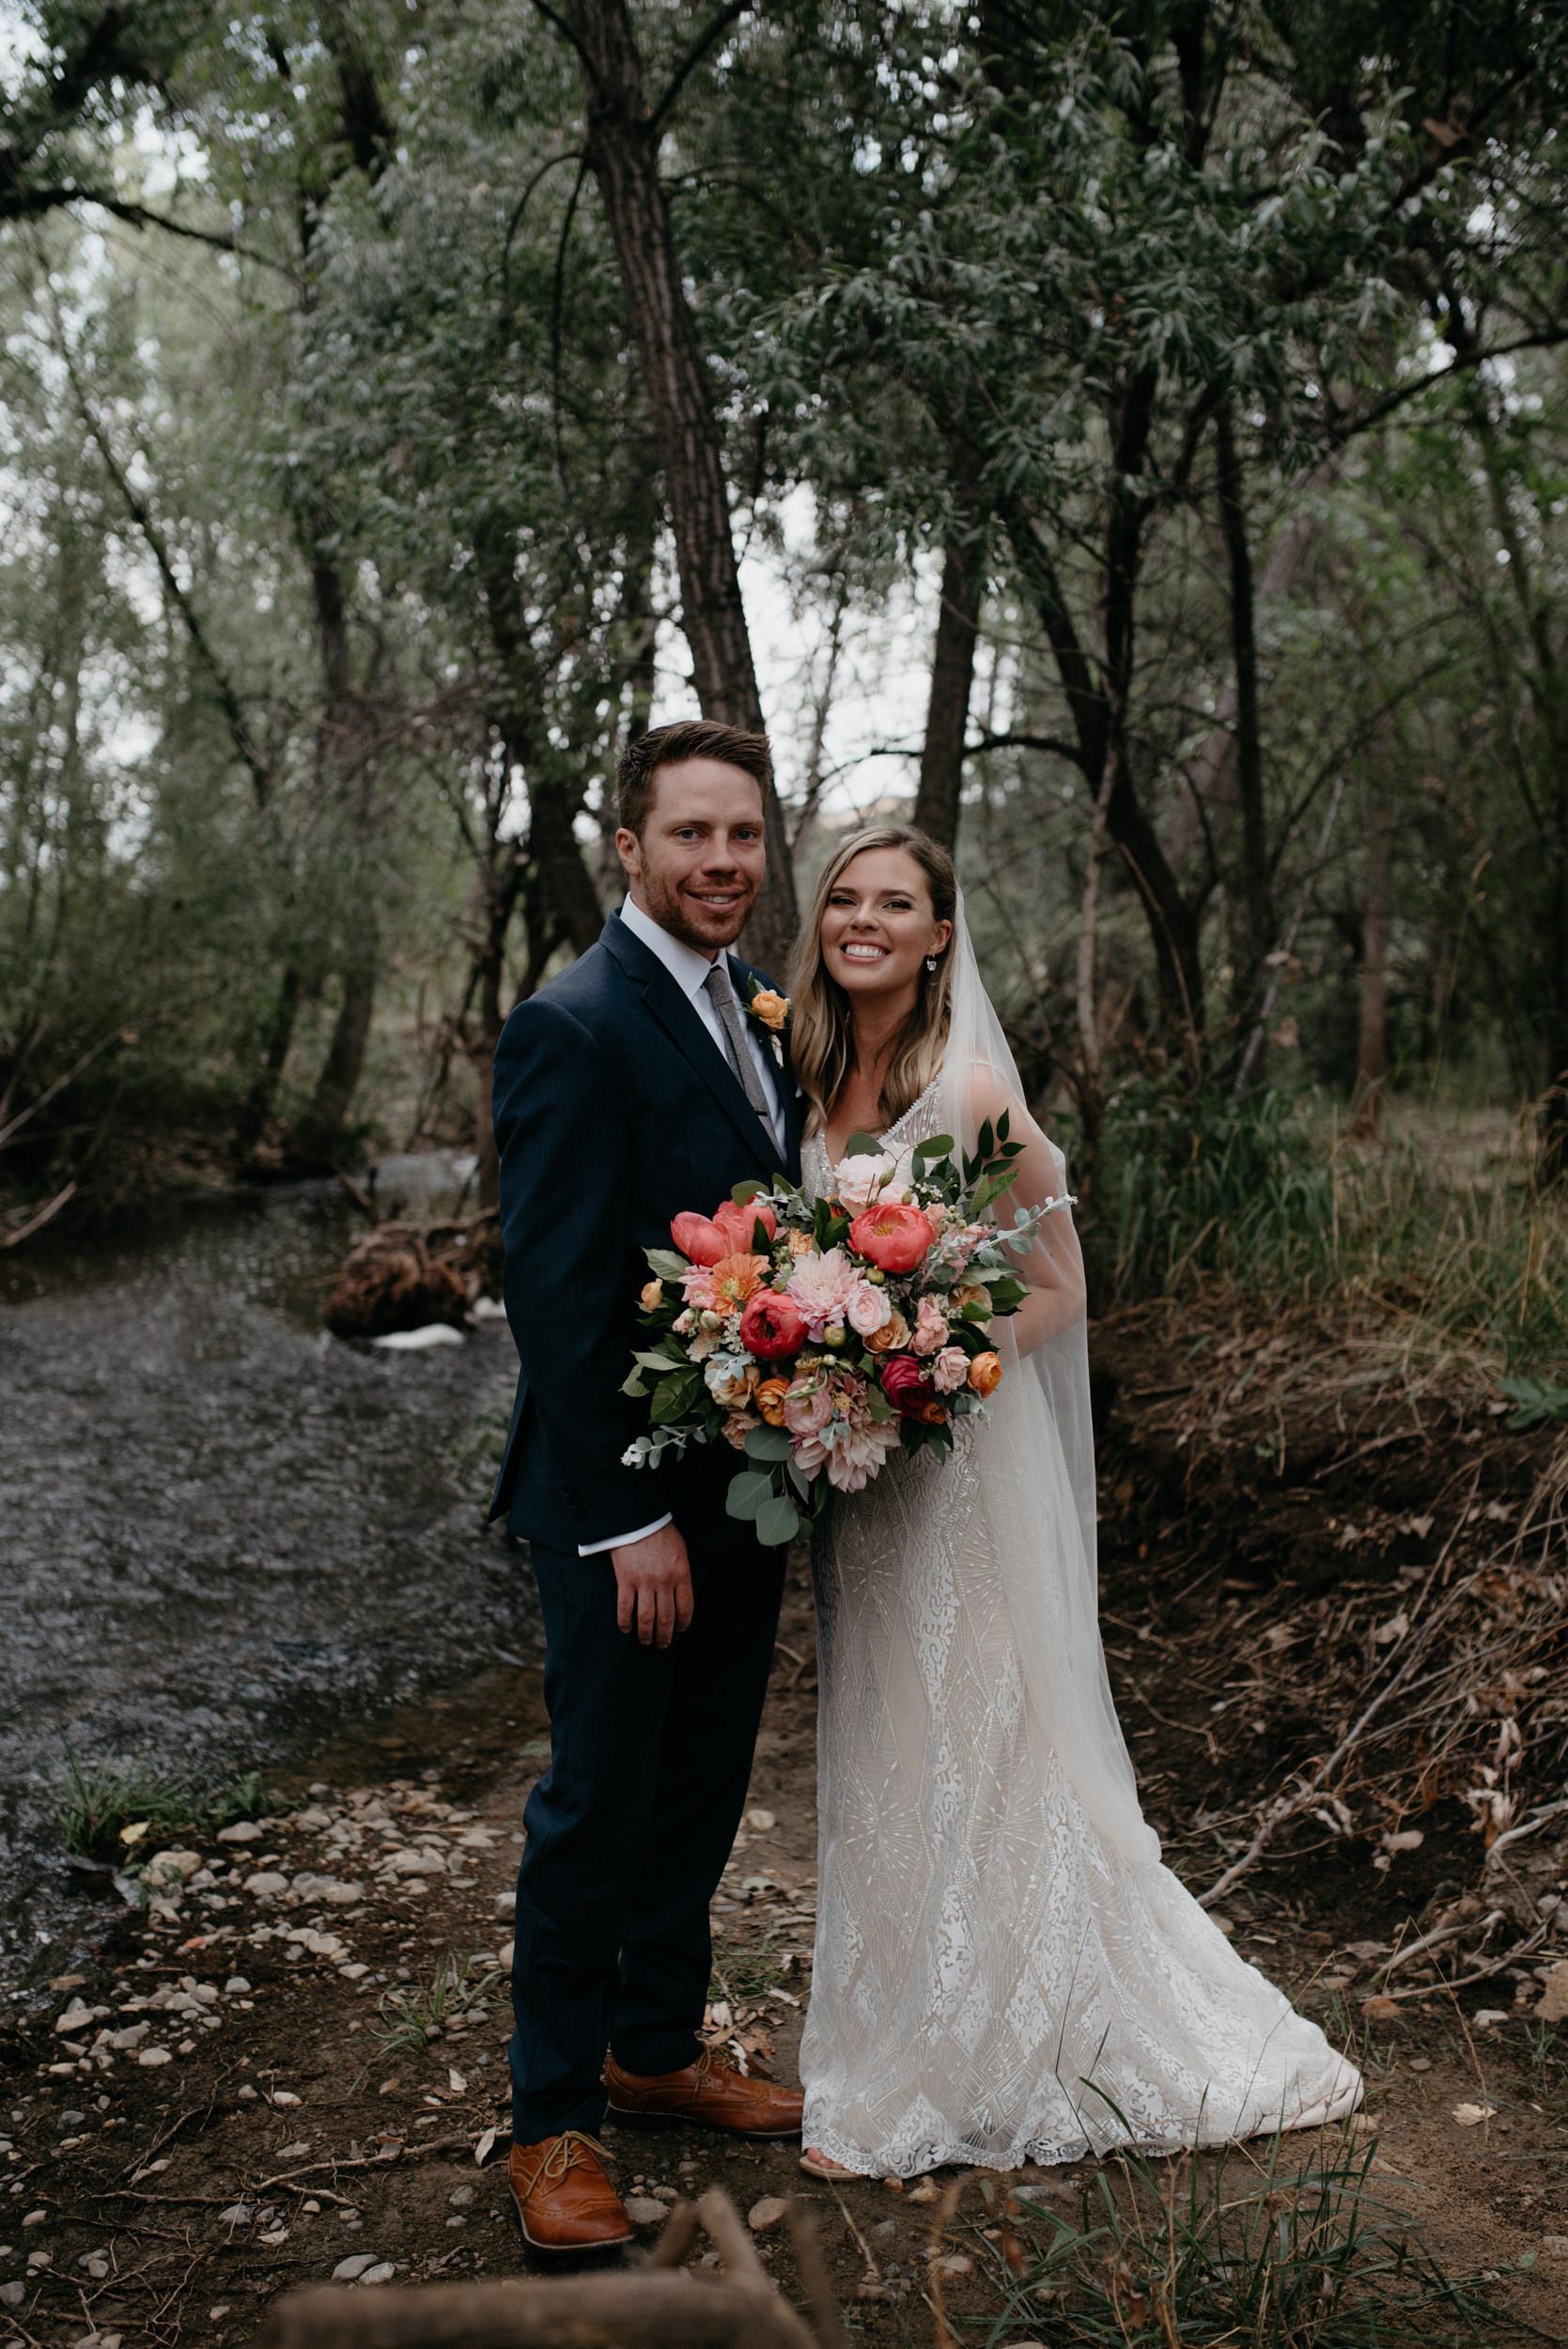 Colorado mountain wedding and elopement photography for adventurous couples.